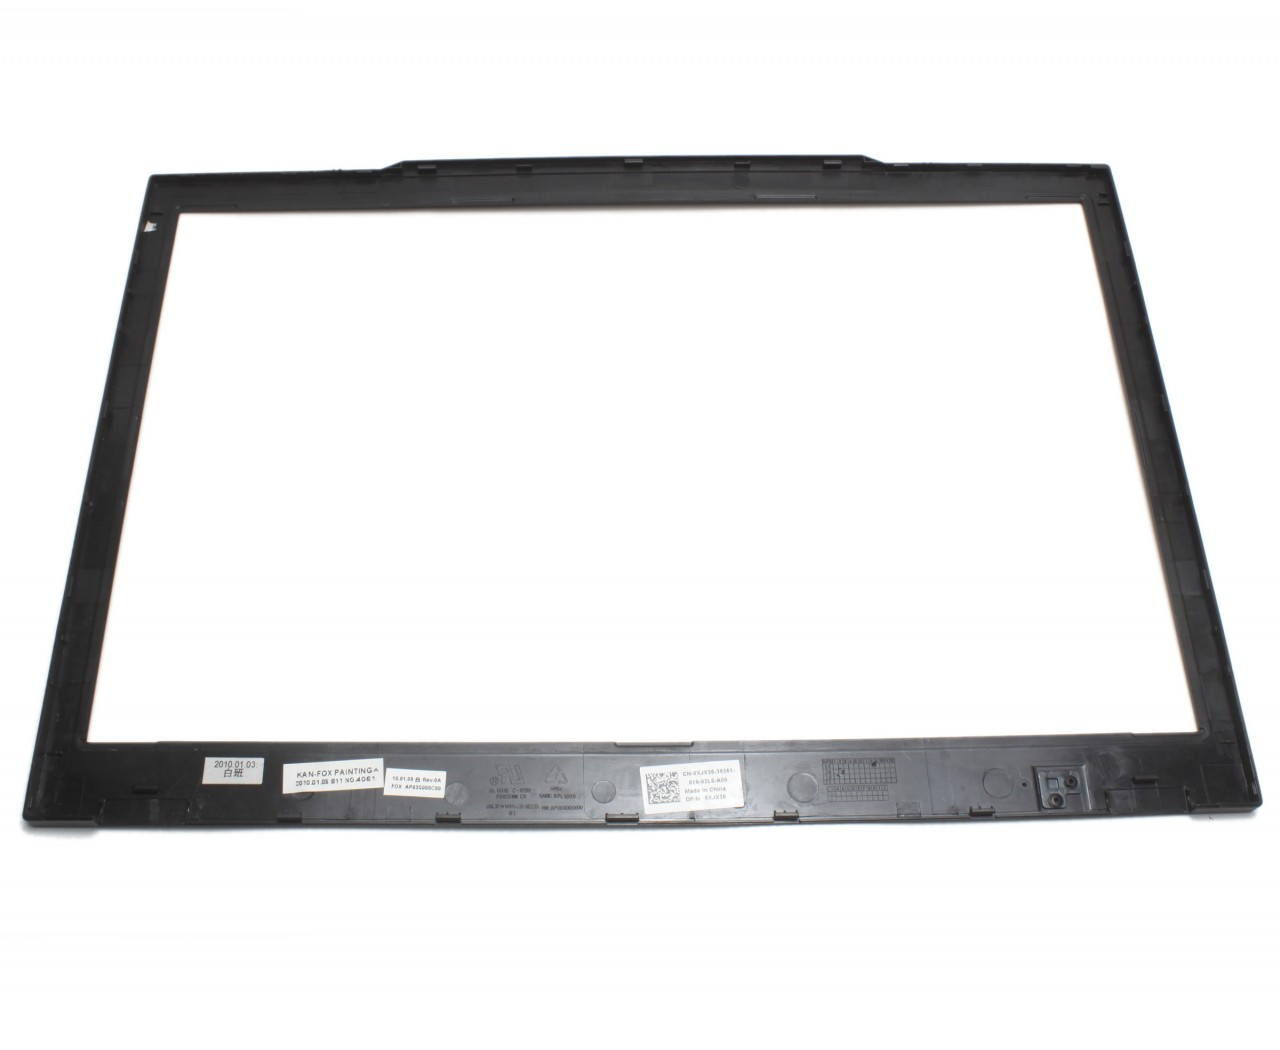 Rama Display Dell Latitude E4300 Bezel Front Cover Neagra imagine powerlaptop.ro 2021